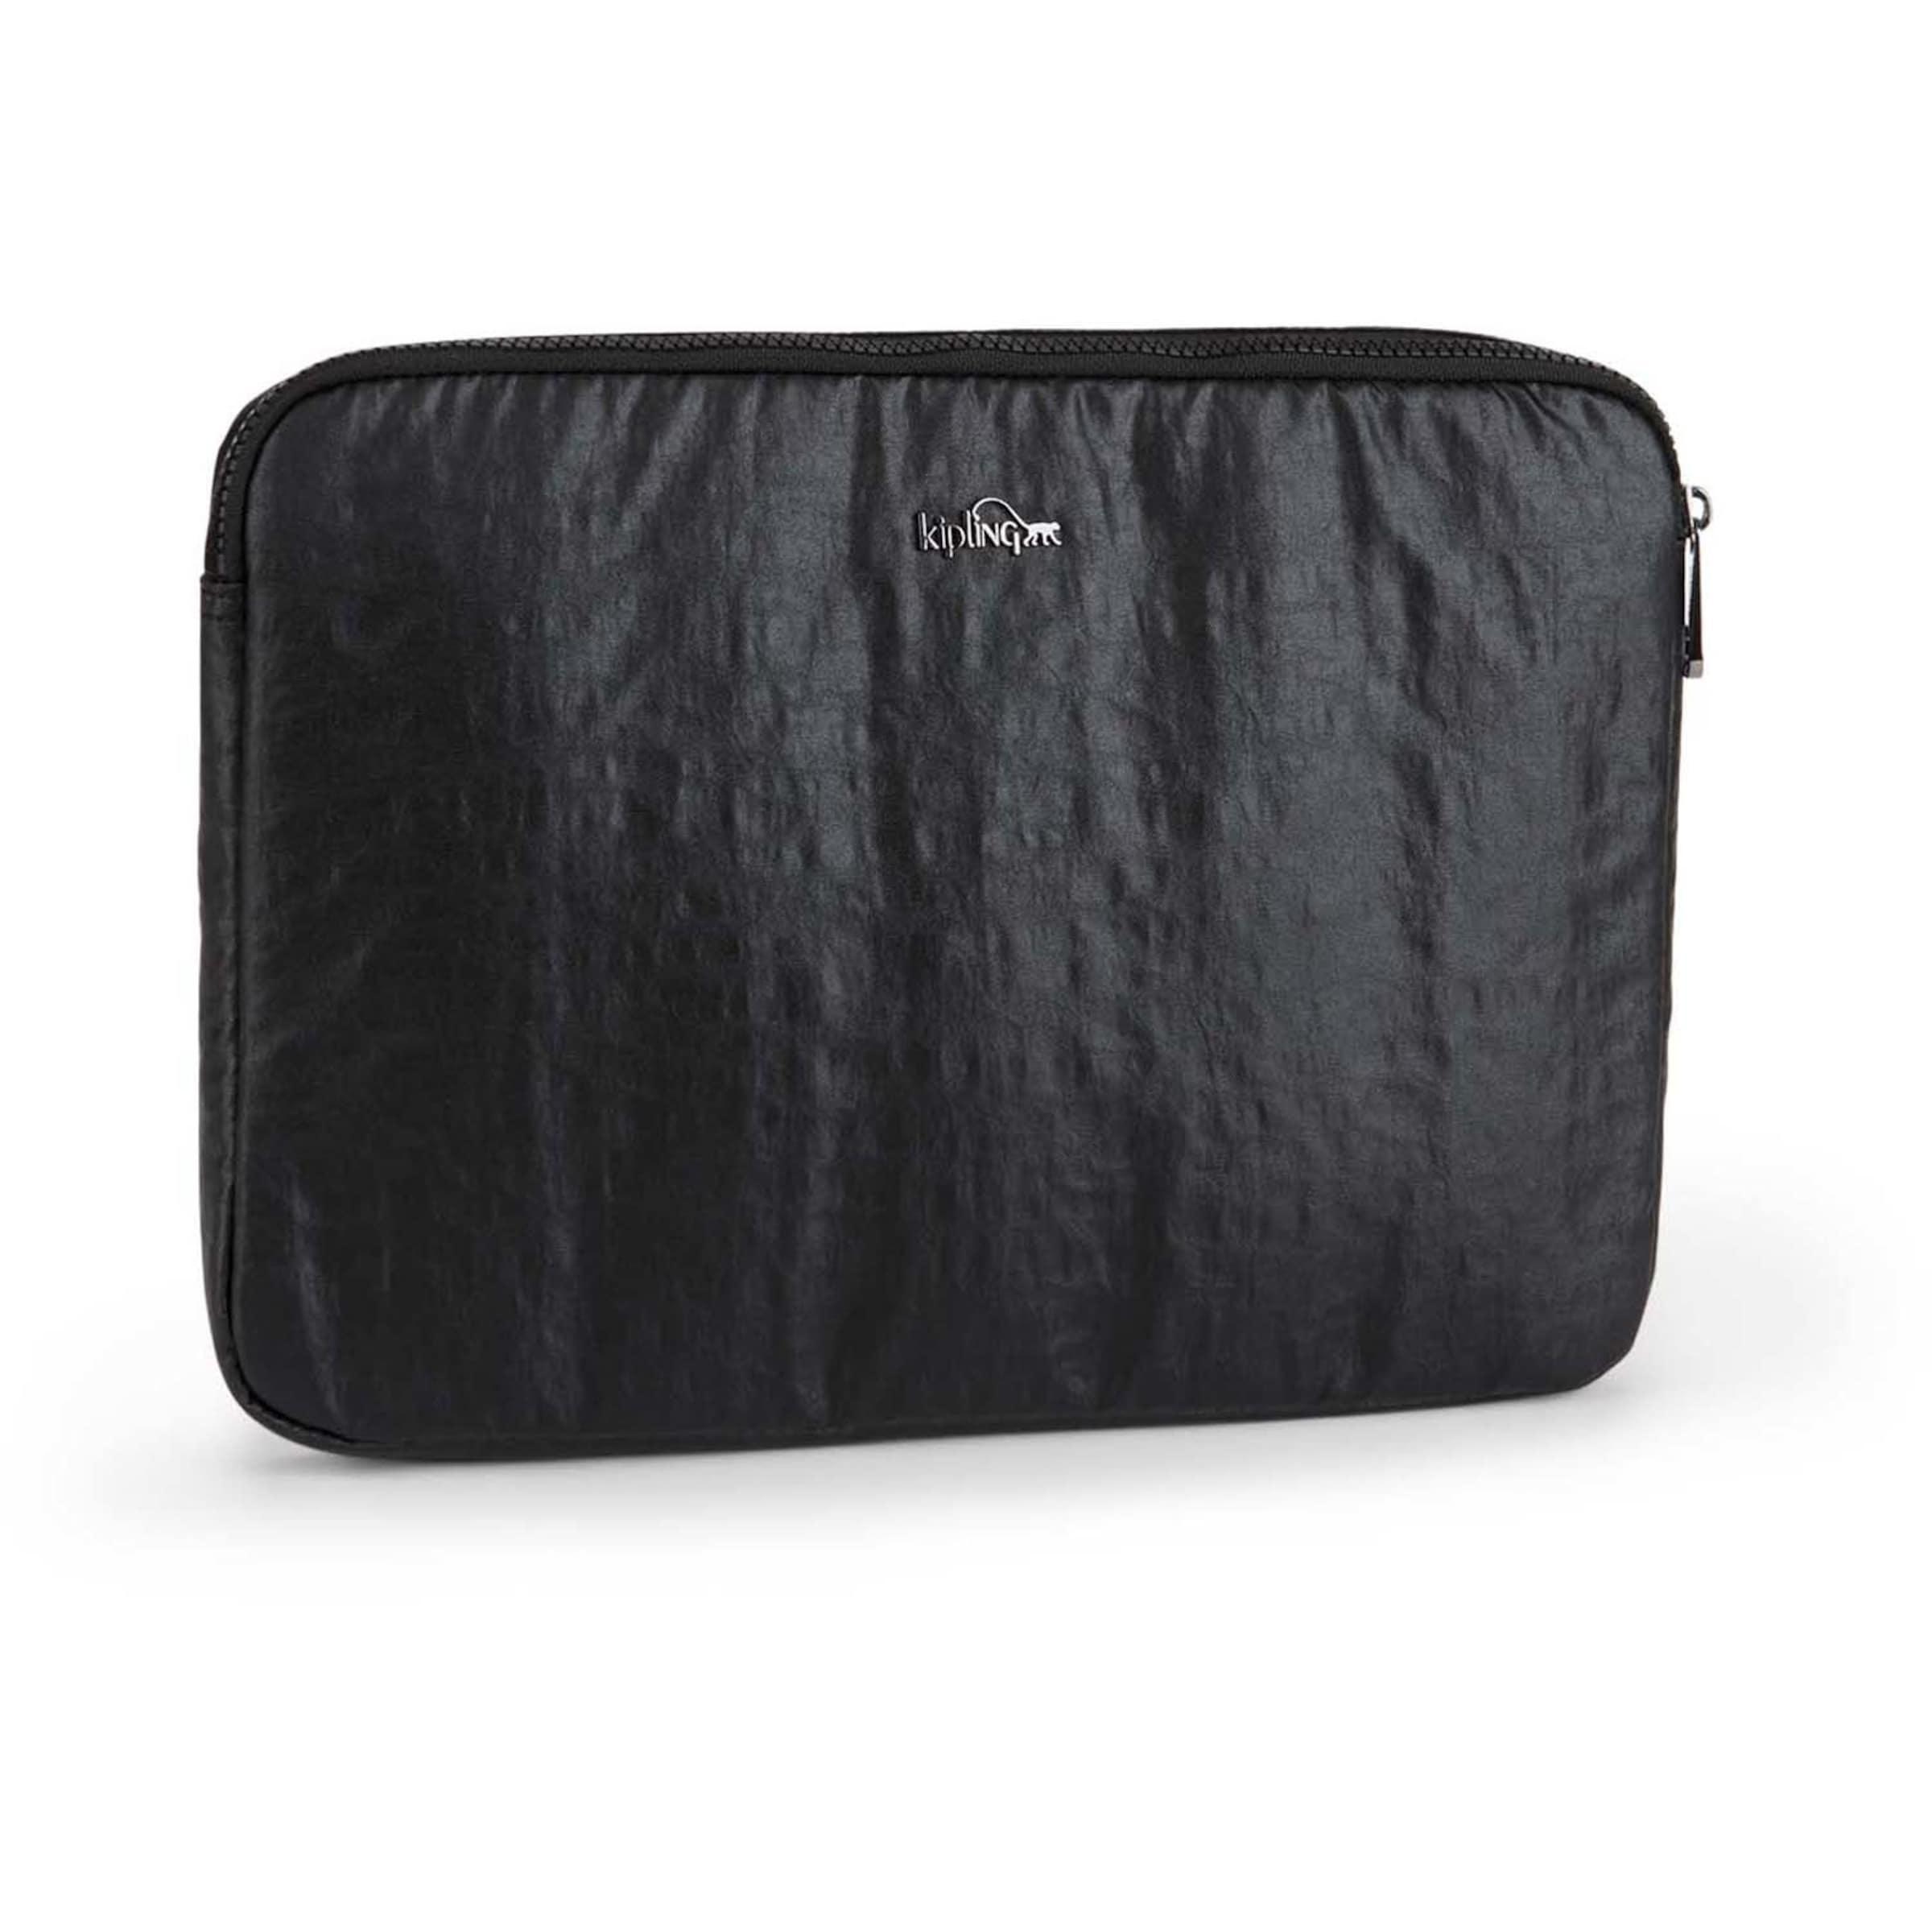 Um Online-Verkauf KIPLING Basic Plus LM Laptophülle 35 cm Niedriger Versand Günstig Online Verkauf Günstiger Preis LlnKFo